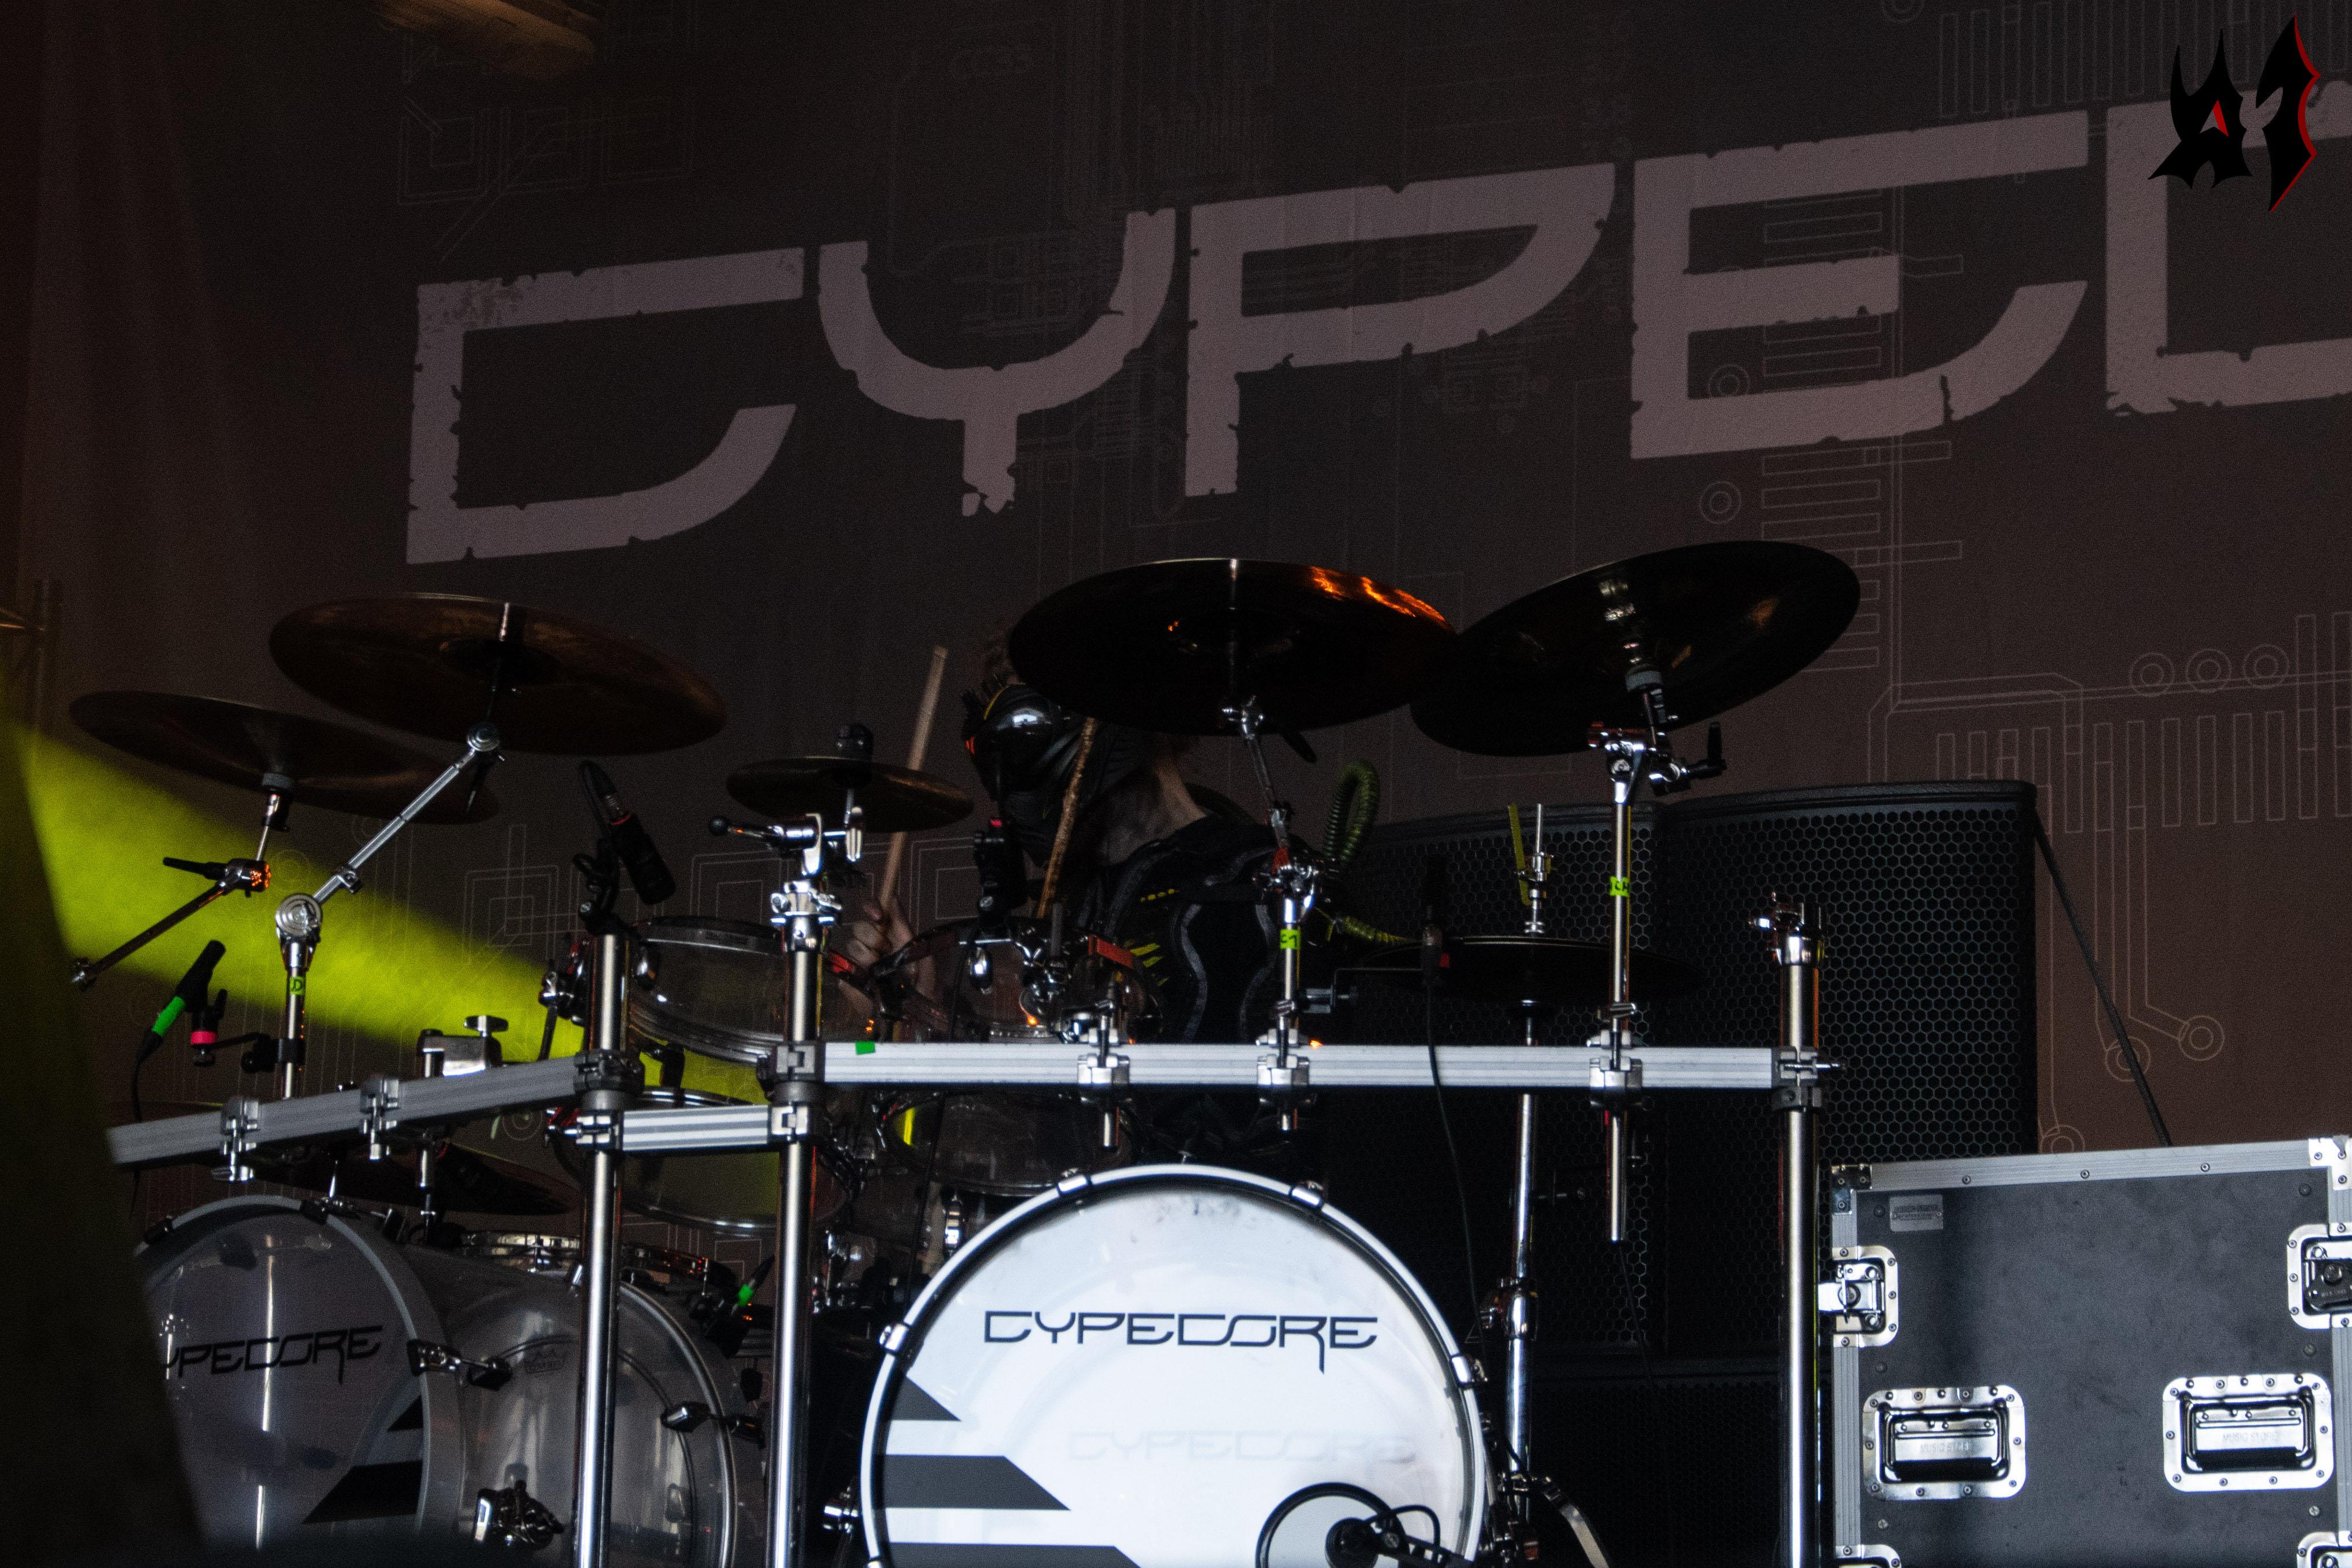 Hellfest - Cypecore - 20